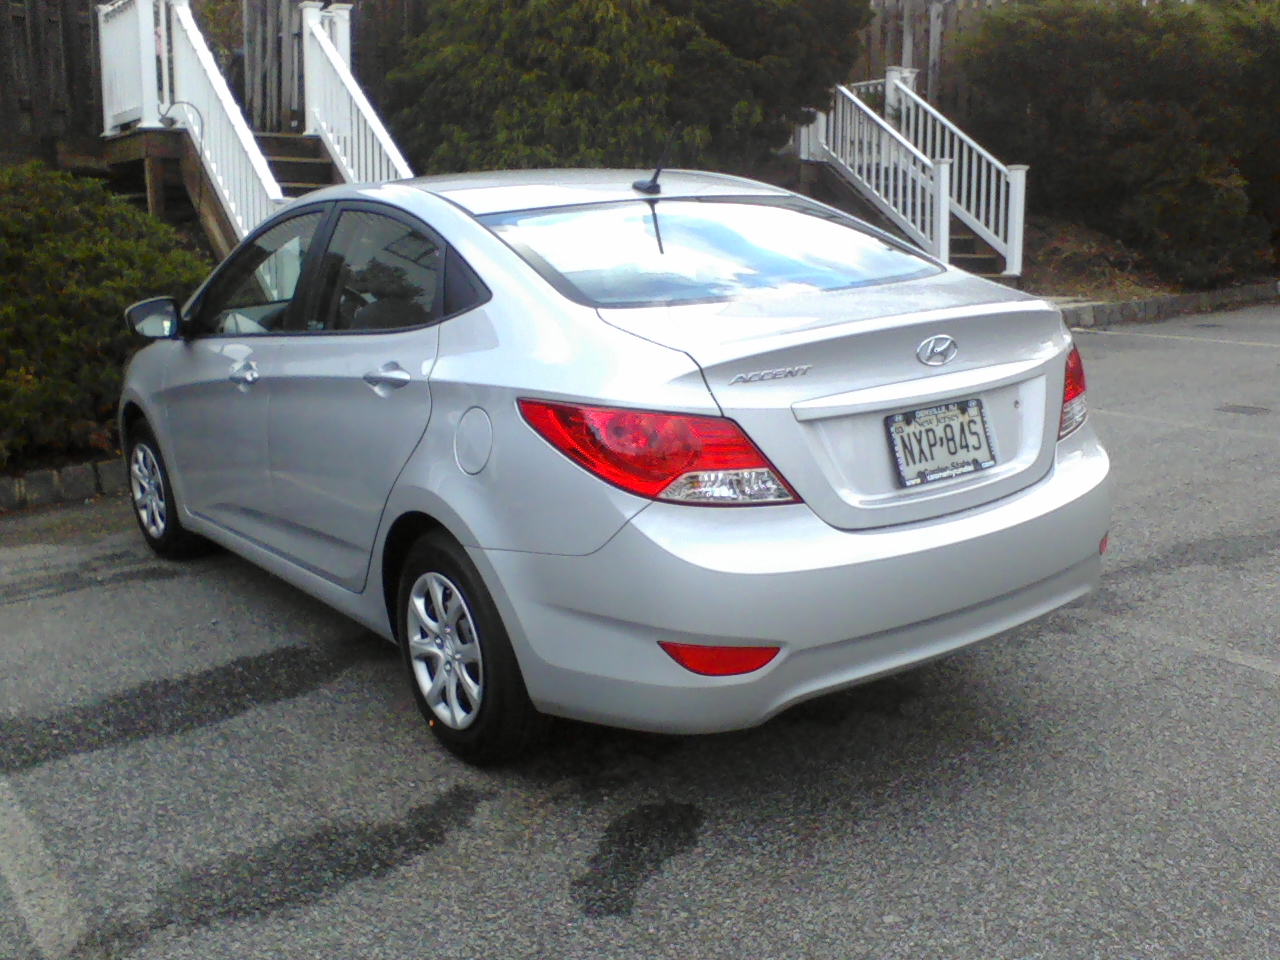 14 Hyundai Accent Brake Goes To Floor 14 Hyundai Accent